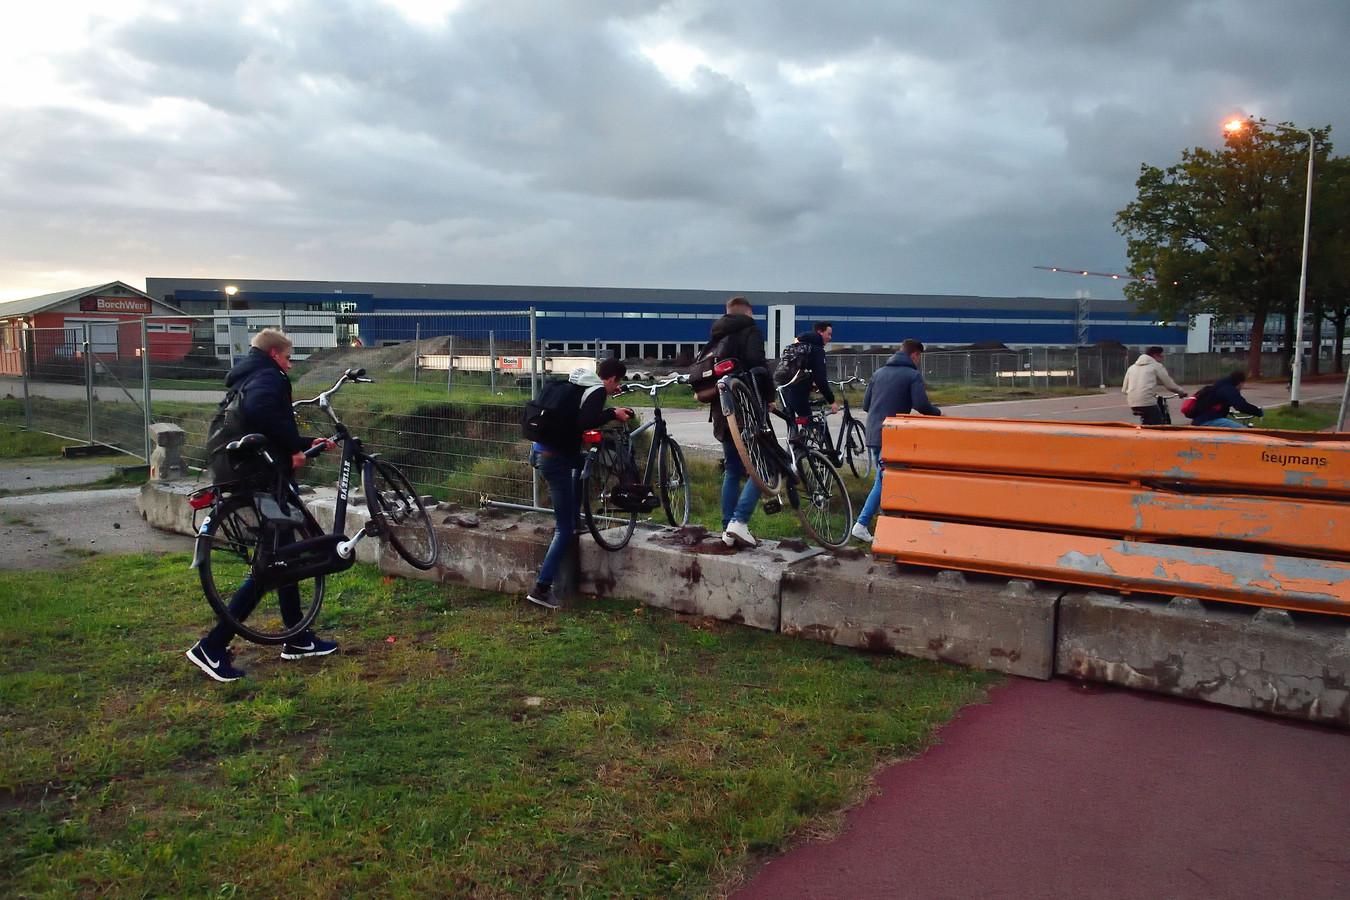 Klauterend over de afzetting vinden de fietsers toch nog de kortste route langs de Gastelseweg.